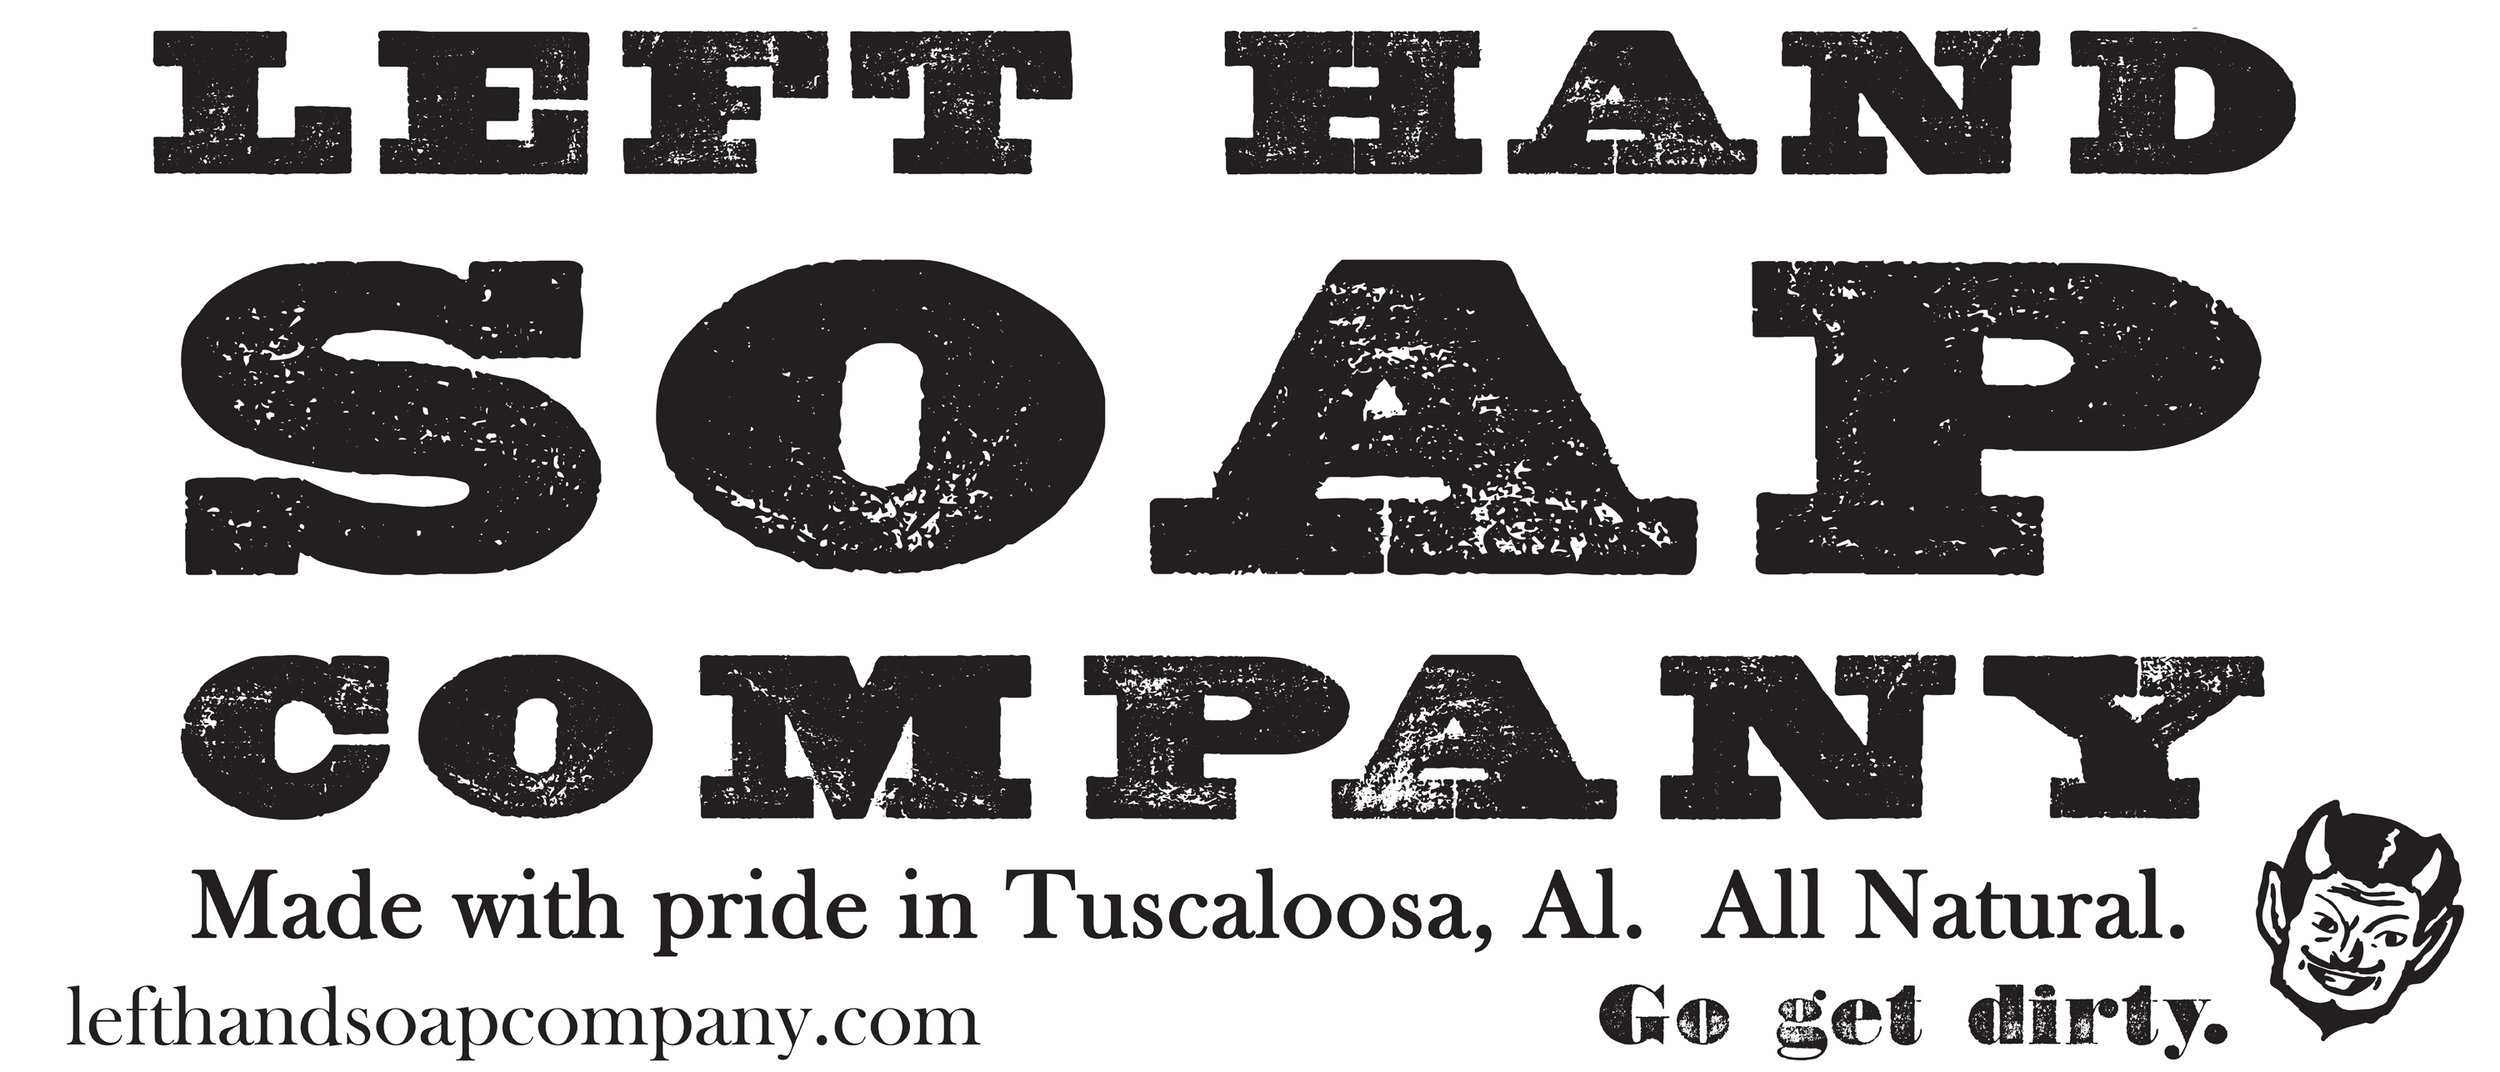 Left Hand Soap Co. - Made in Tuscaloosa, Alabama, Left Hand Soap Co. has 20 years of natural soap and skincare experience. You got skin, they've got soap.lefthandsoapcompany.com#LHSCo #gogetdirty #20years2214 University BlvdTuscaloosa, AL 35401